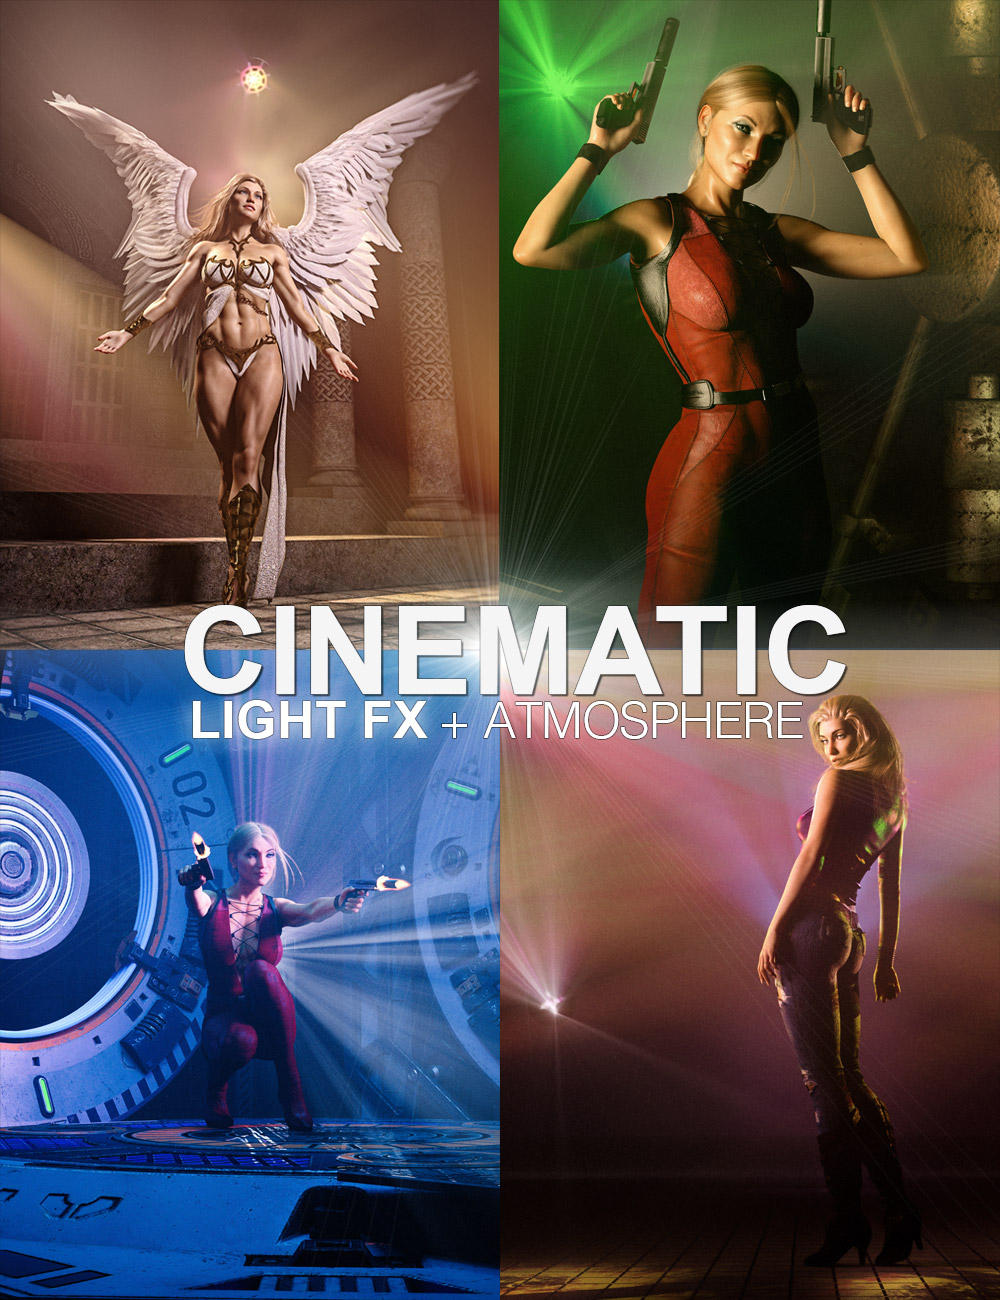 Cinematic Light FX plus Atmosphere by: Colm Jackson, 3D Models by Daz 3D